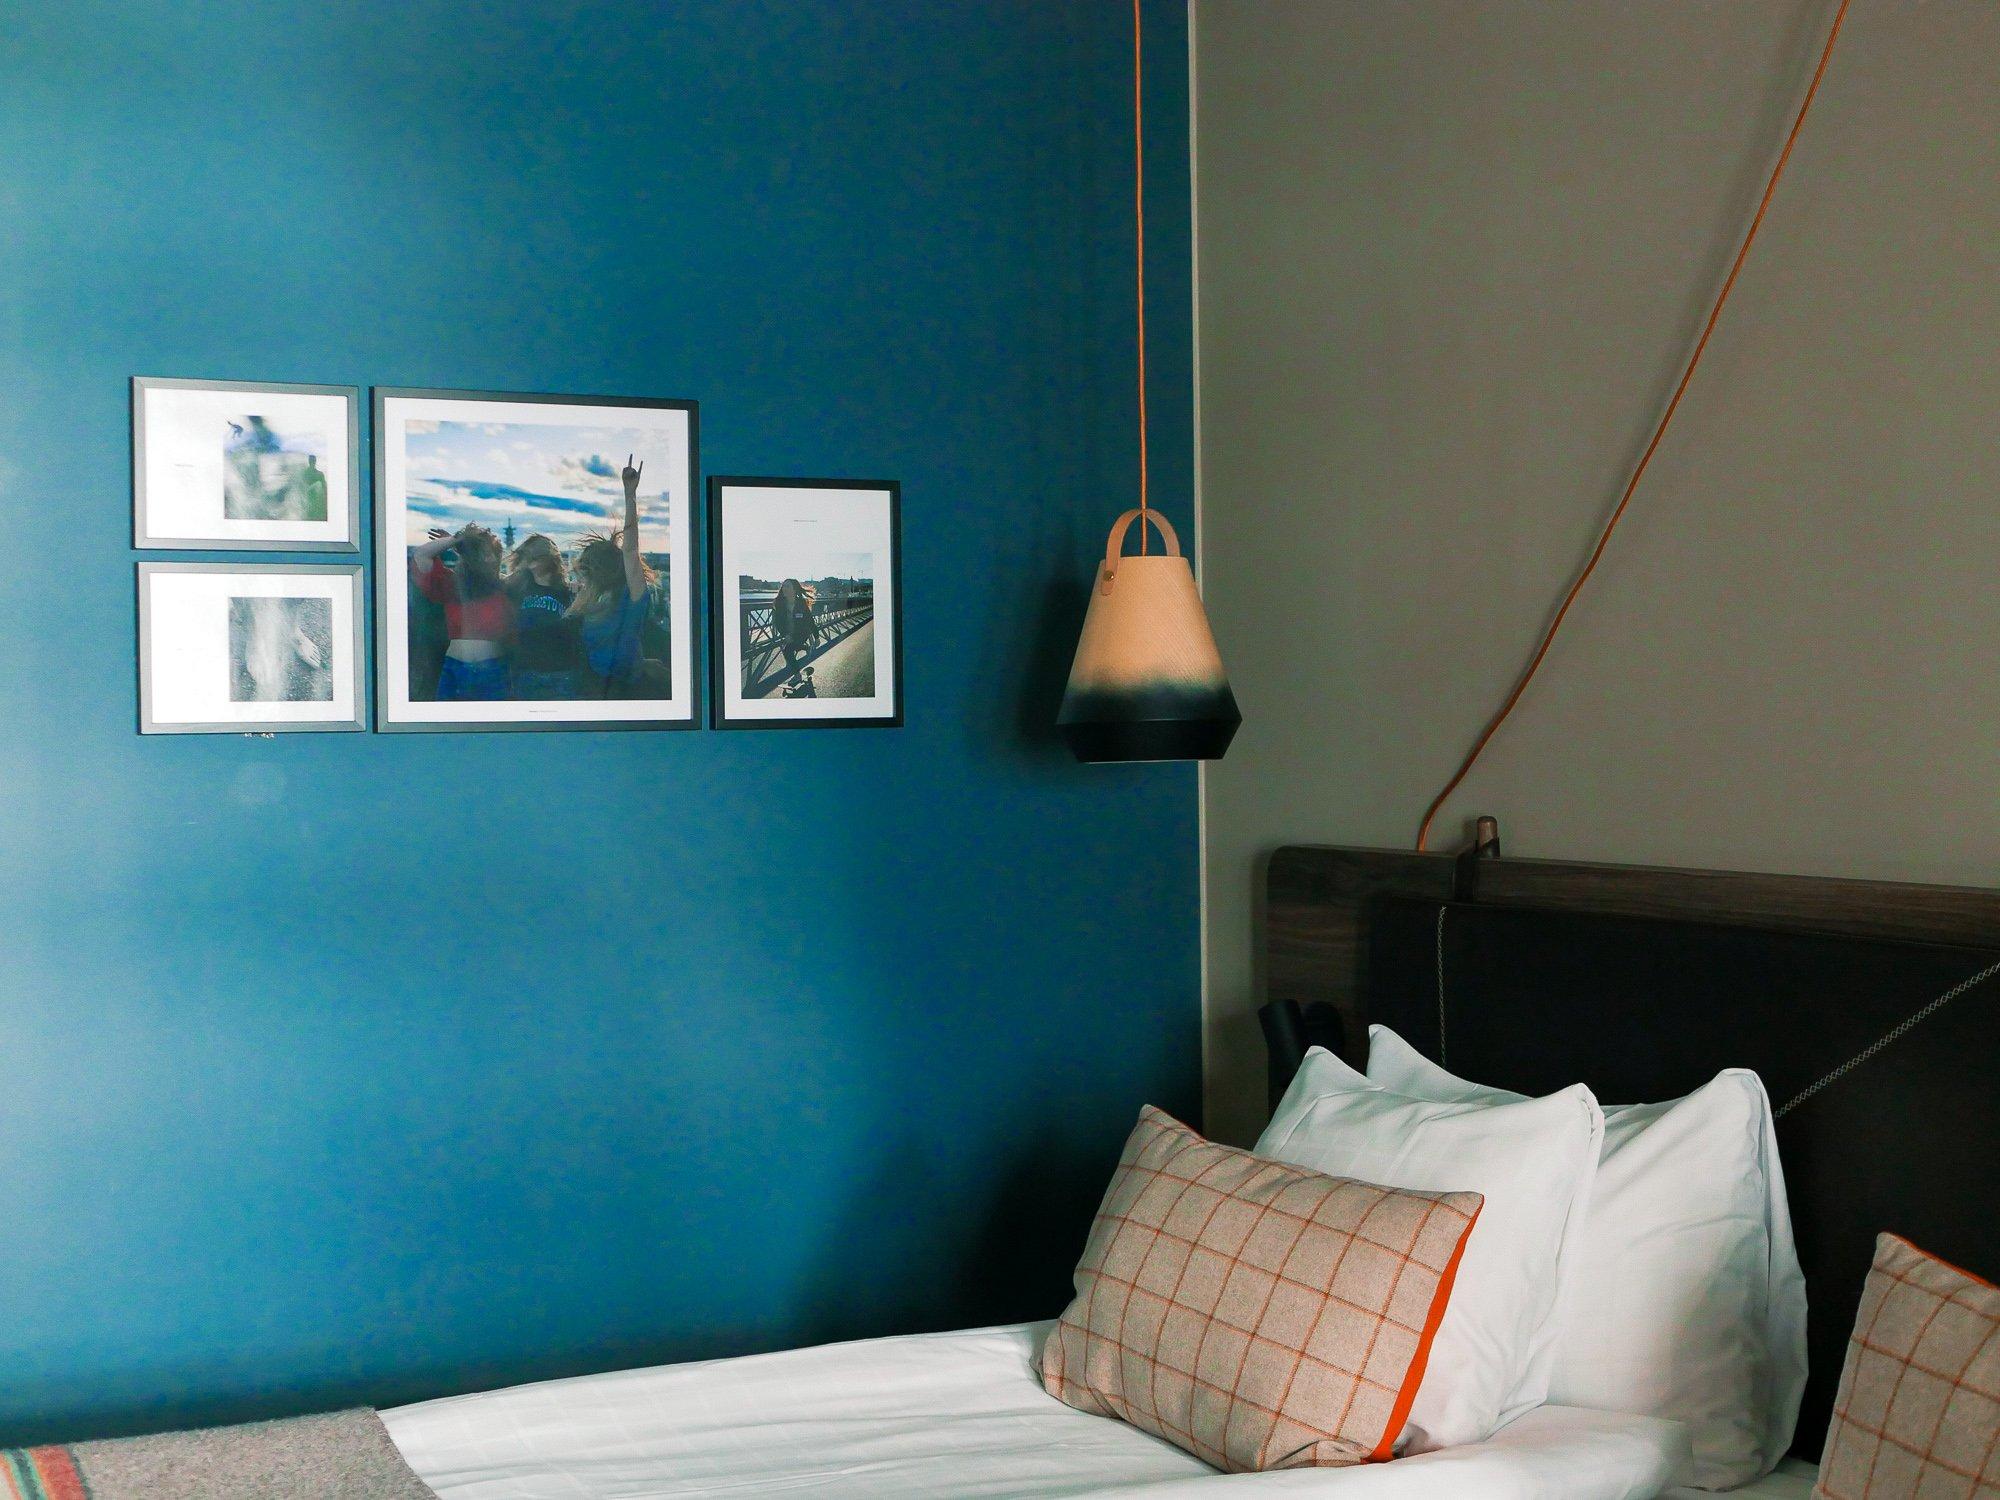 avis dowtown camper by scandic Stockholm / hotel Stockholm